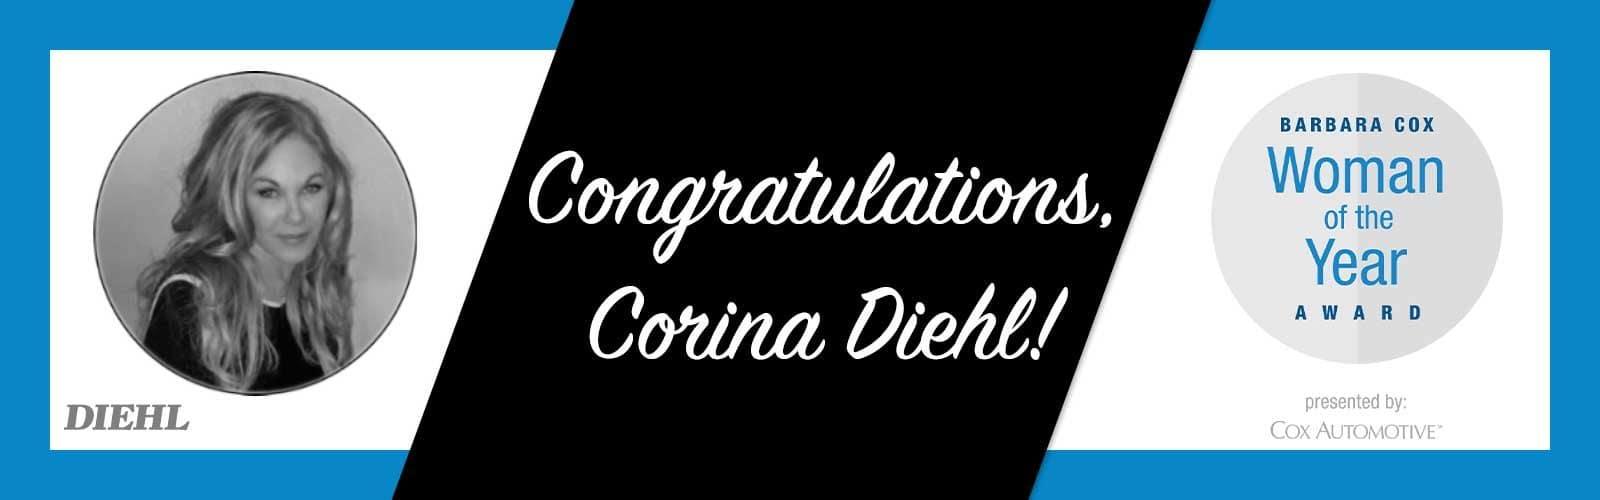 cox automotive corina diehl barbara cox woman of the year award 2021 diehl automotive group